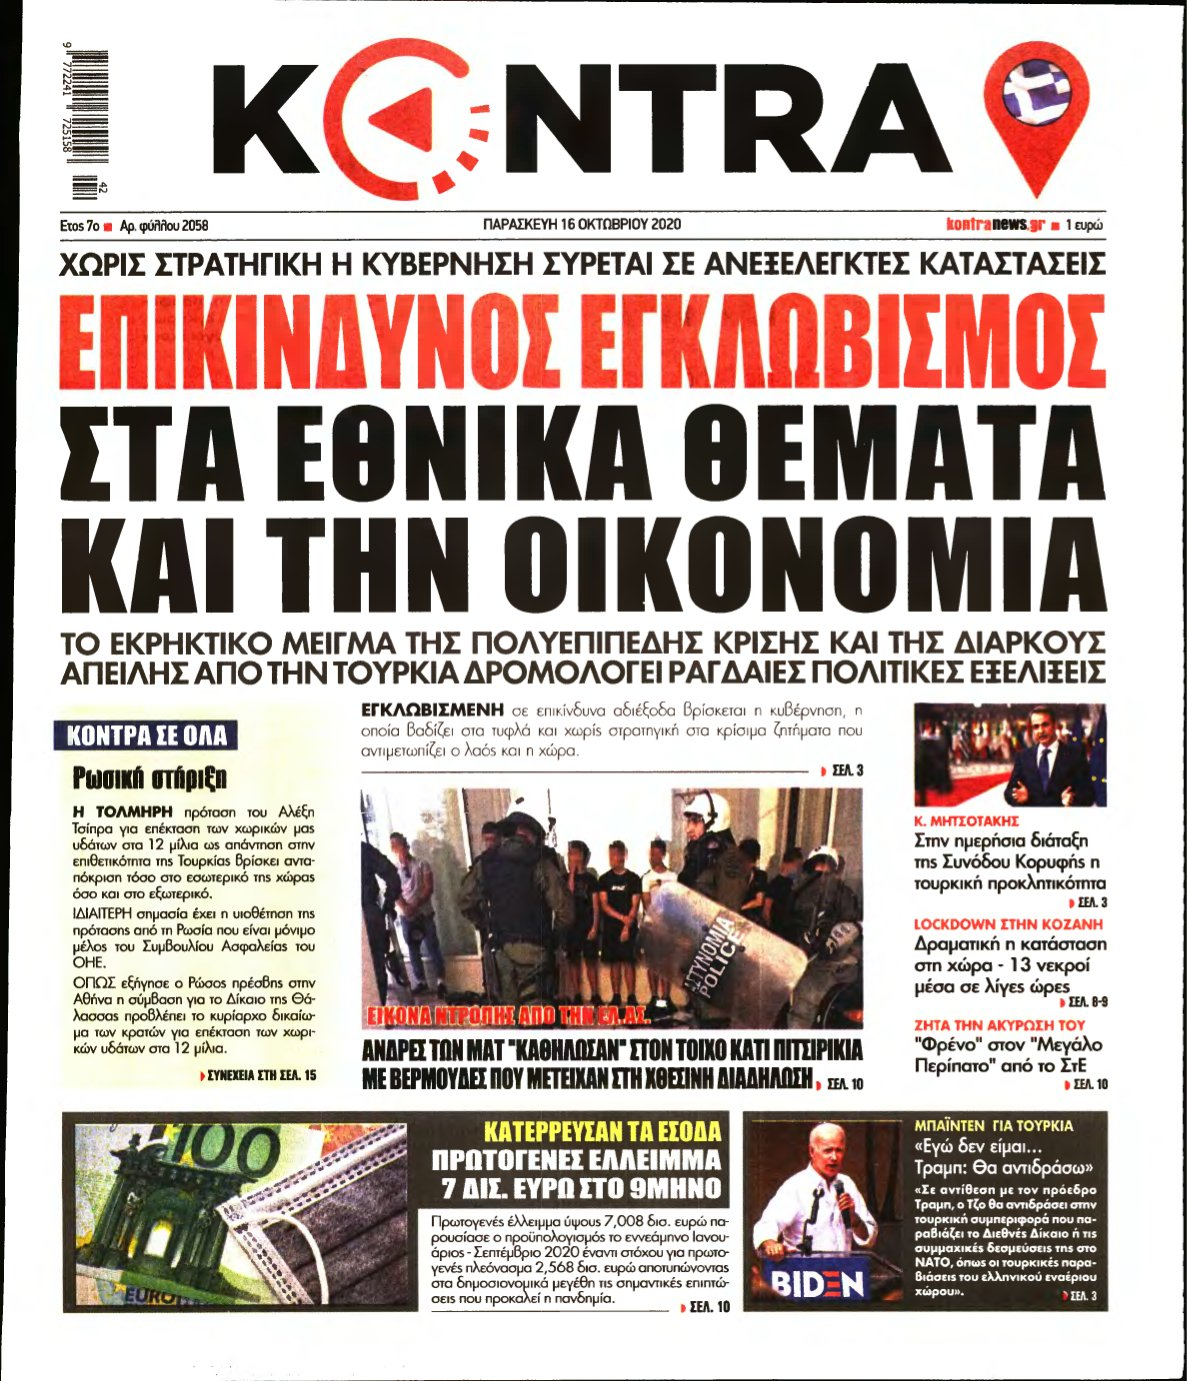 KONTRA NEWS – 16/10/2020